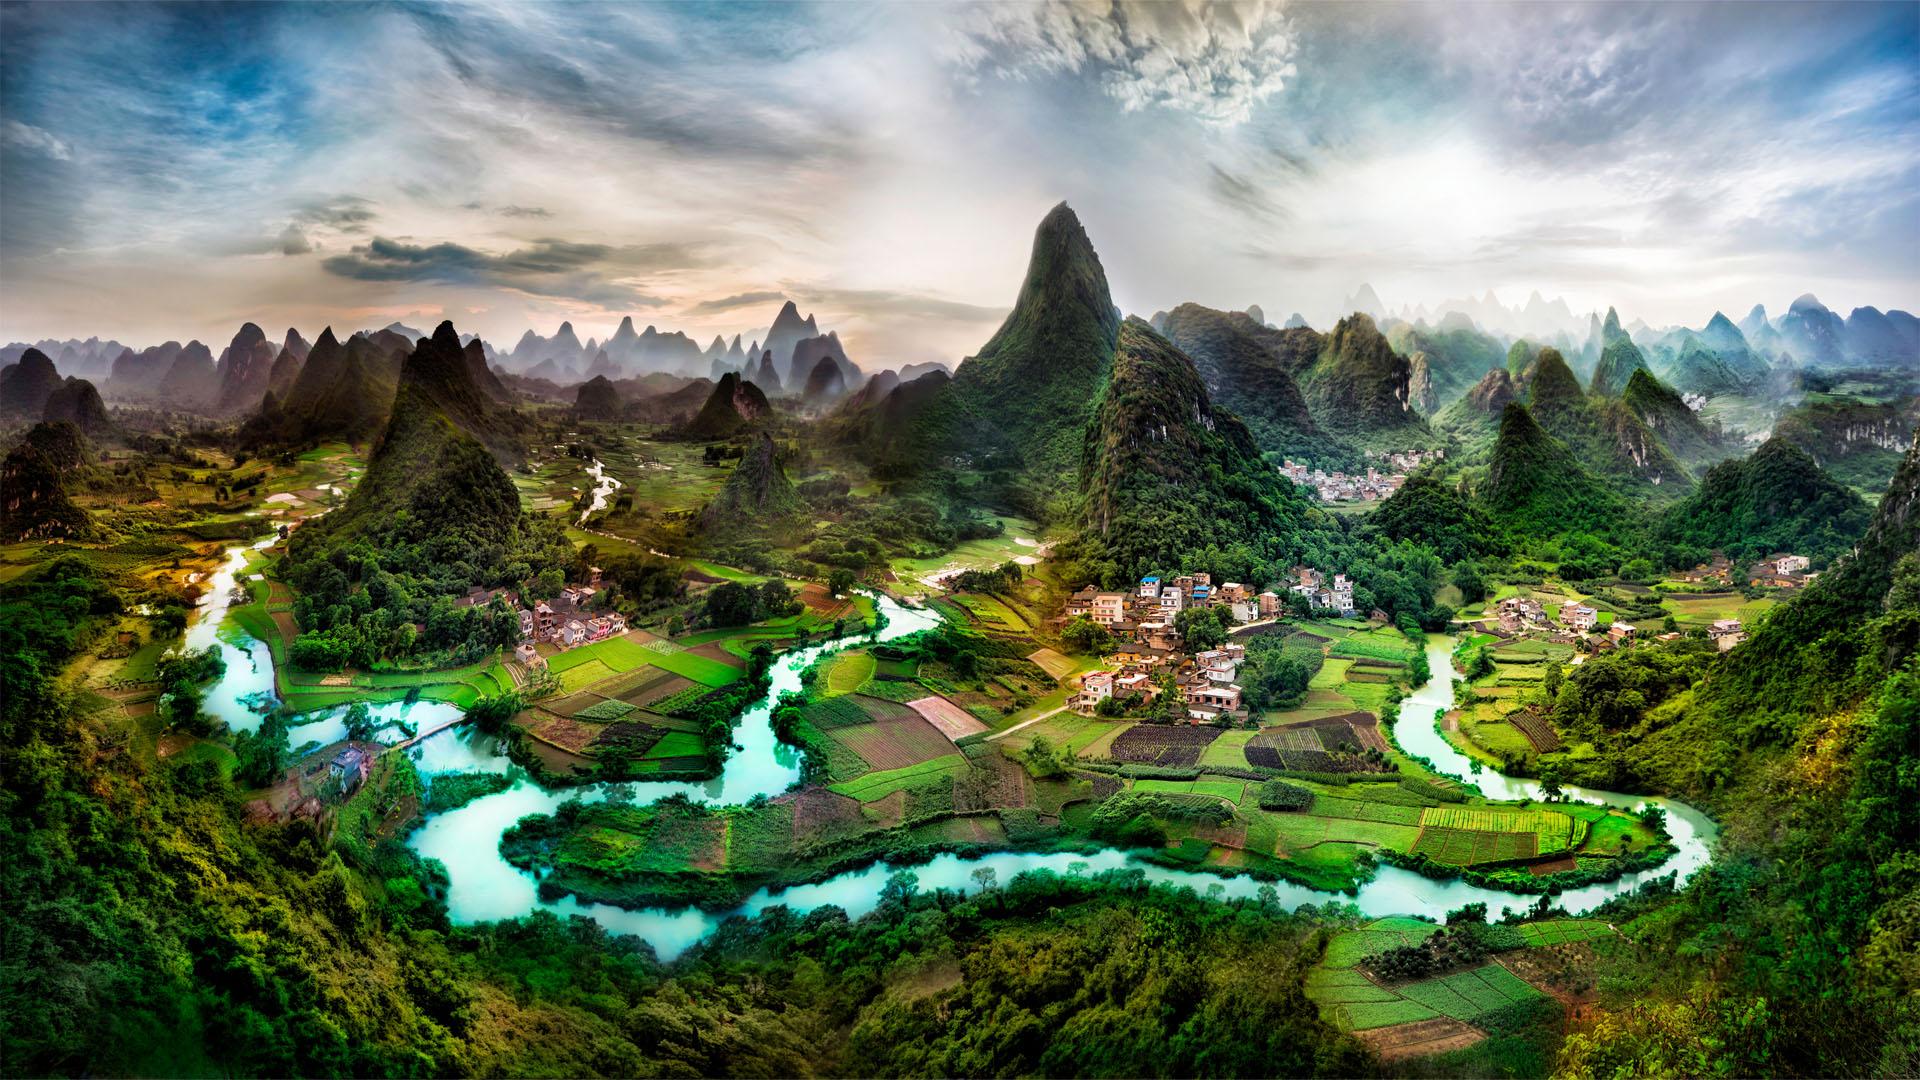 Beautiful Landscape Desktop Background Wallpaper 1920x1080